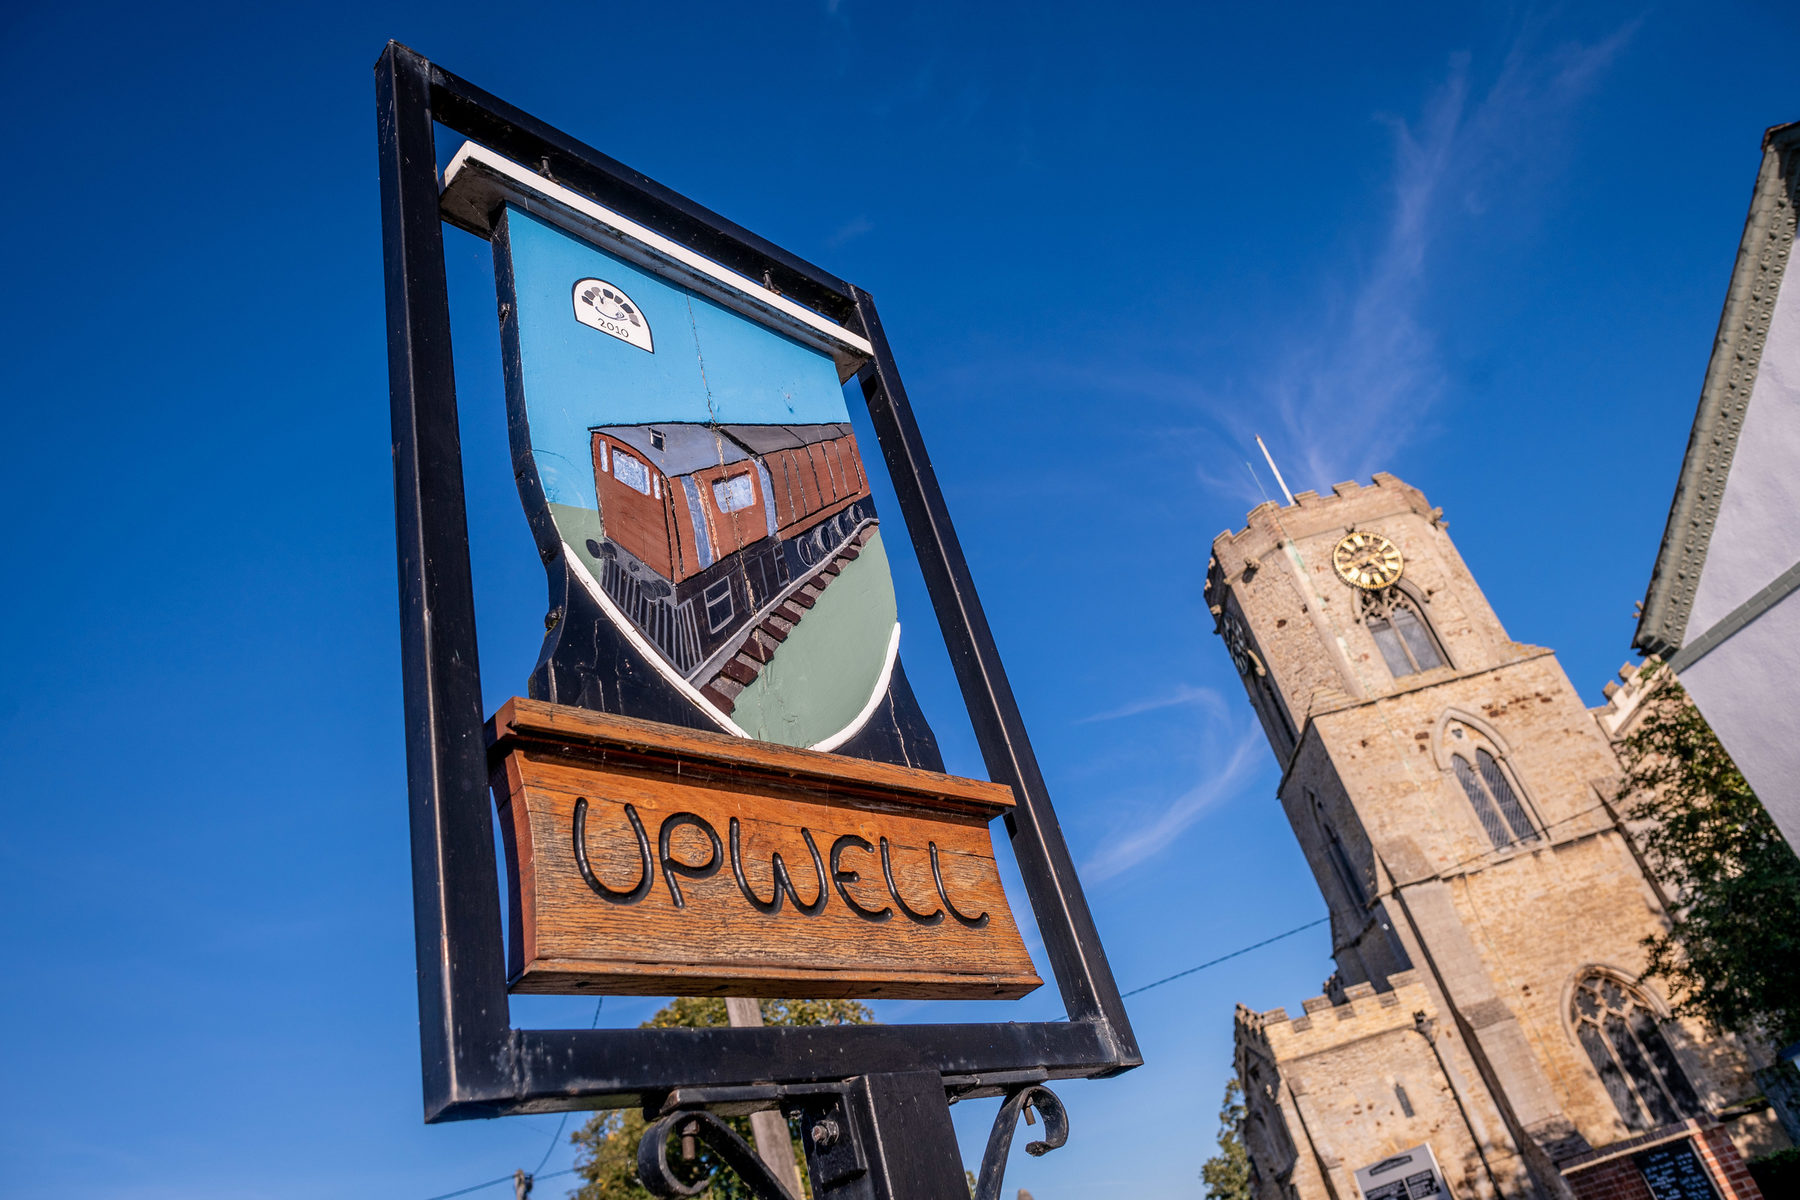 009 Upwell Village 2018